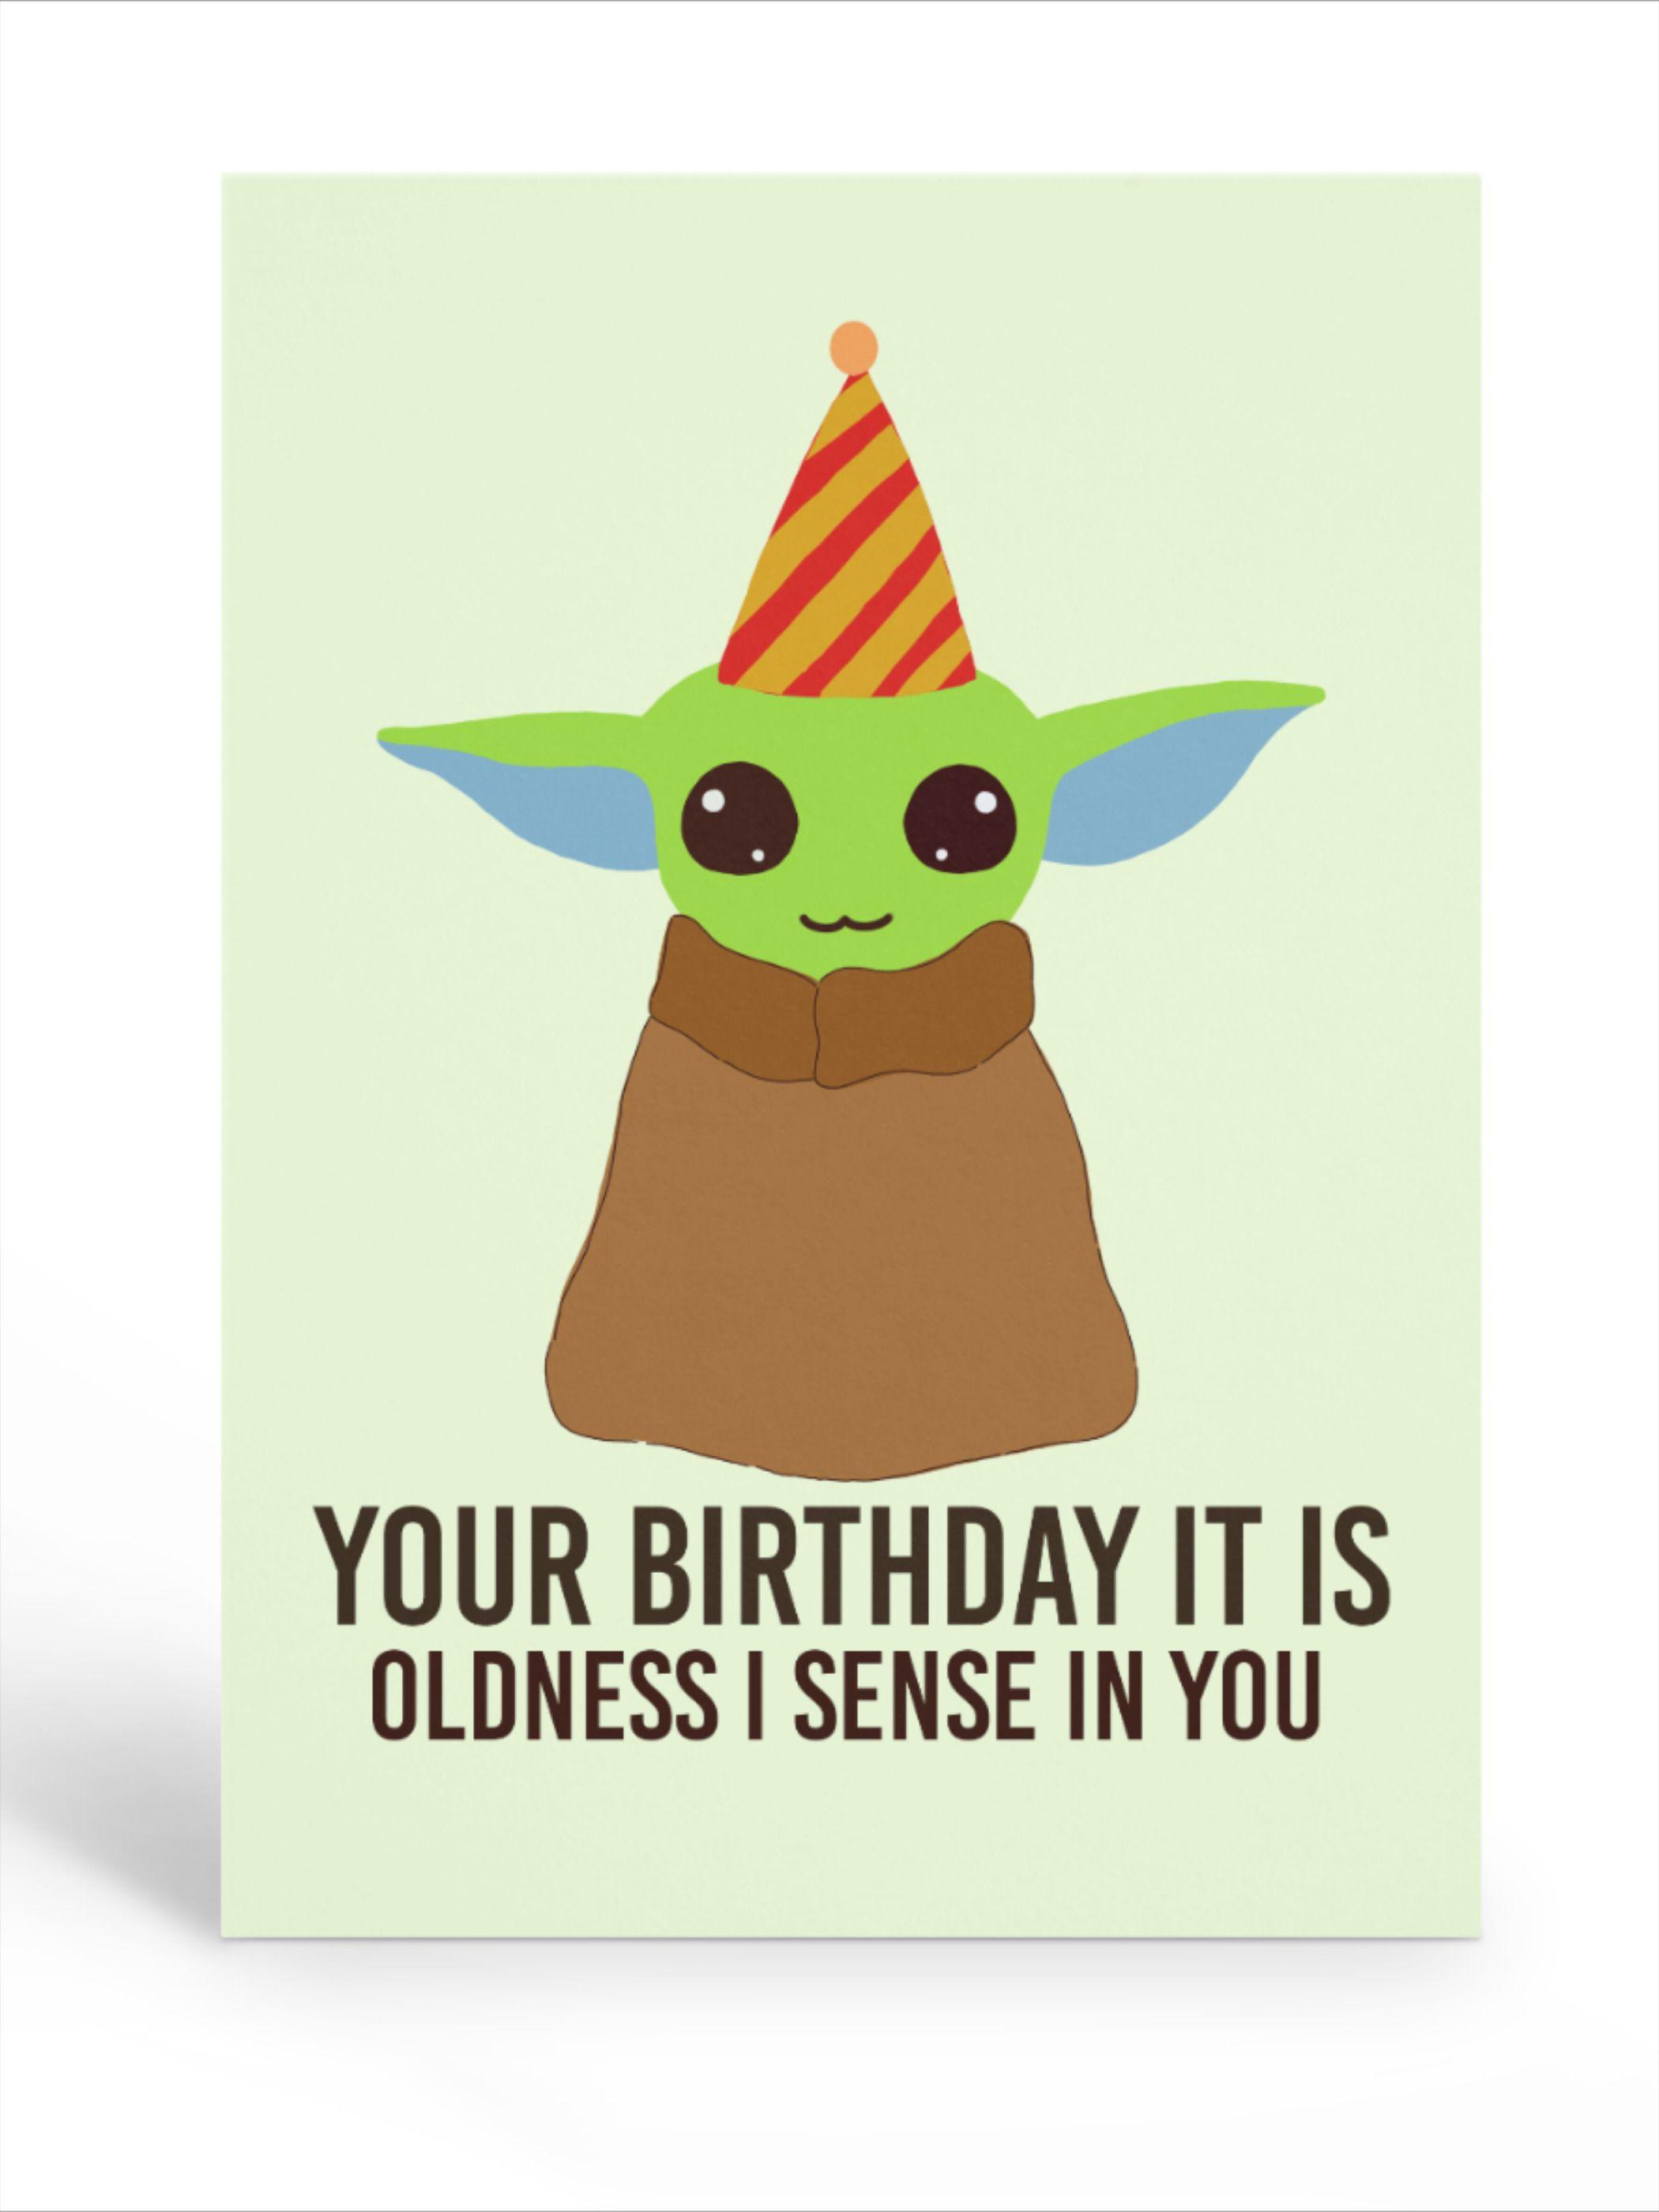 Star Wars Baby Yoda Happy Birthday Card Yoda Happy Birthday Cool Birthday Cards Yoda Card